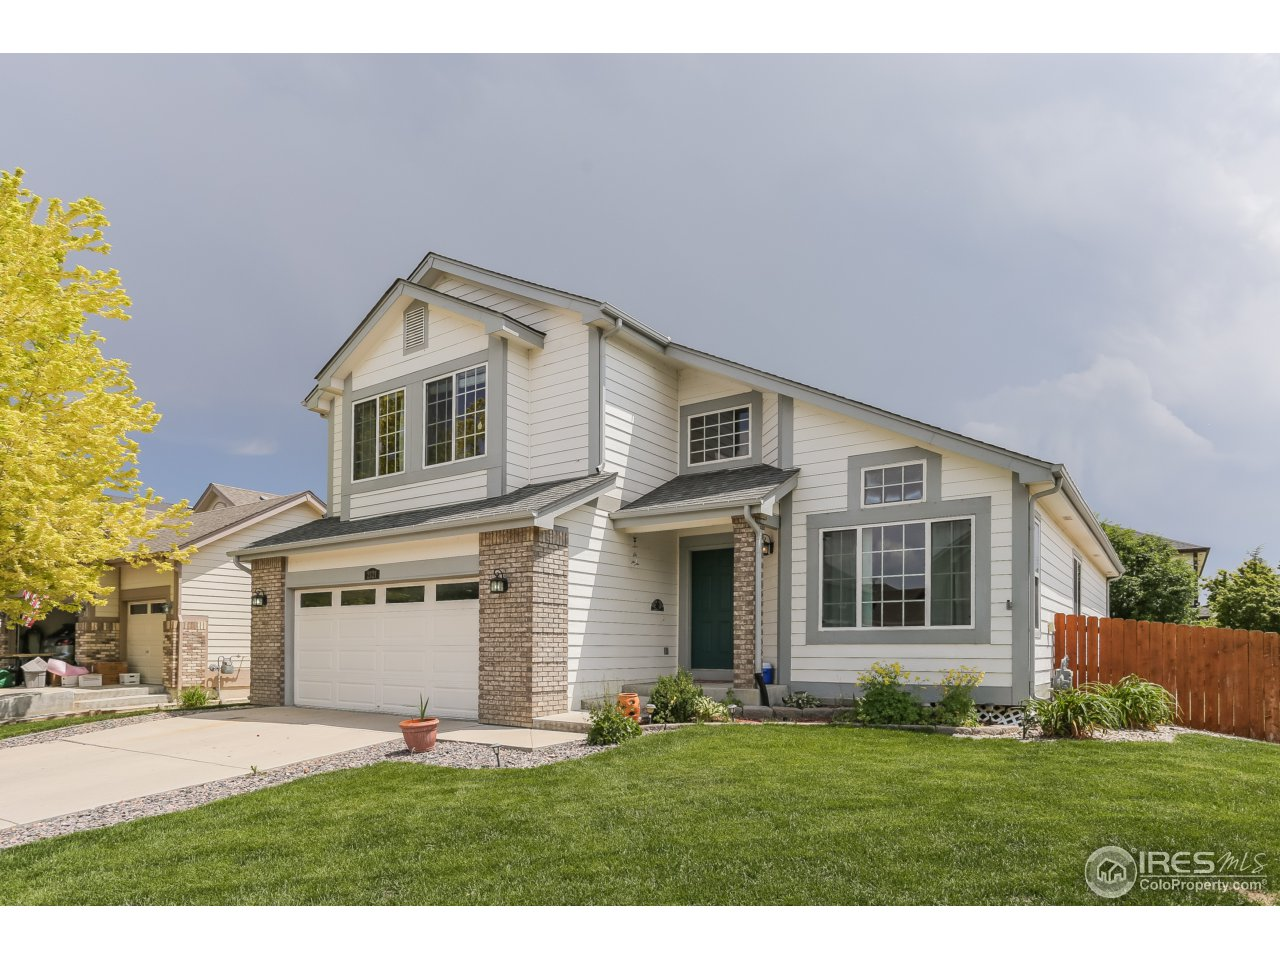 2121 Andrews St, Fort Collins CO 80528